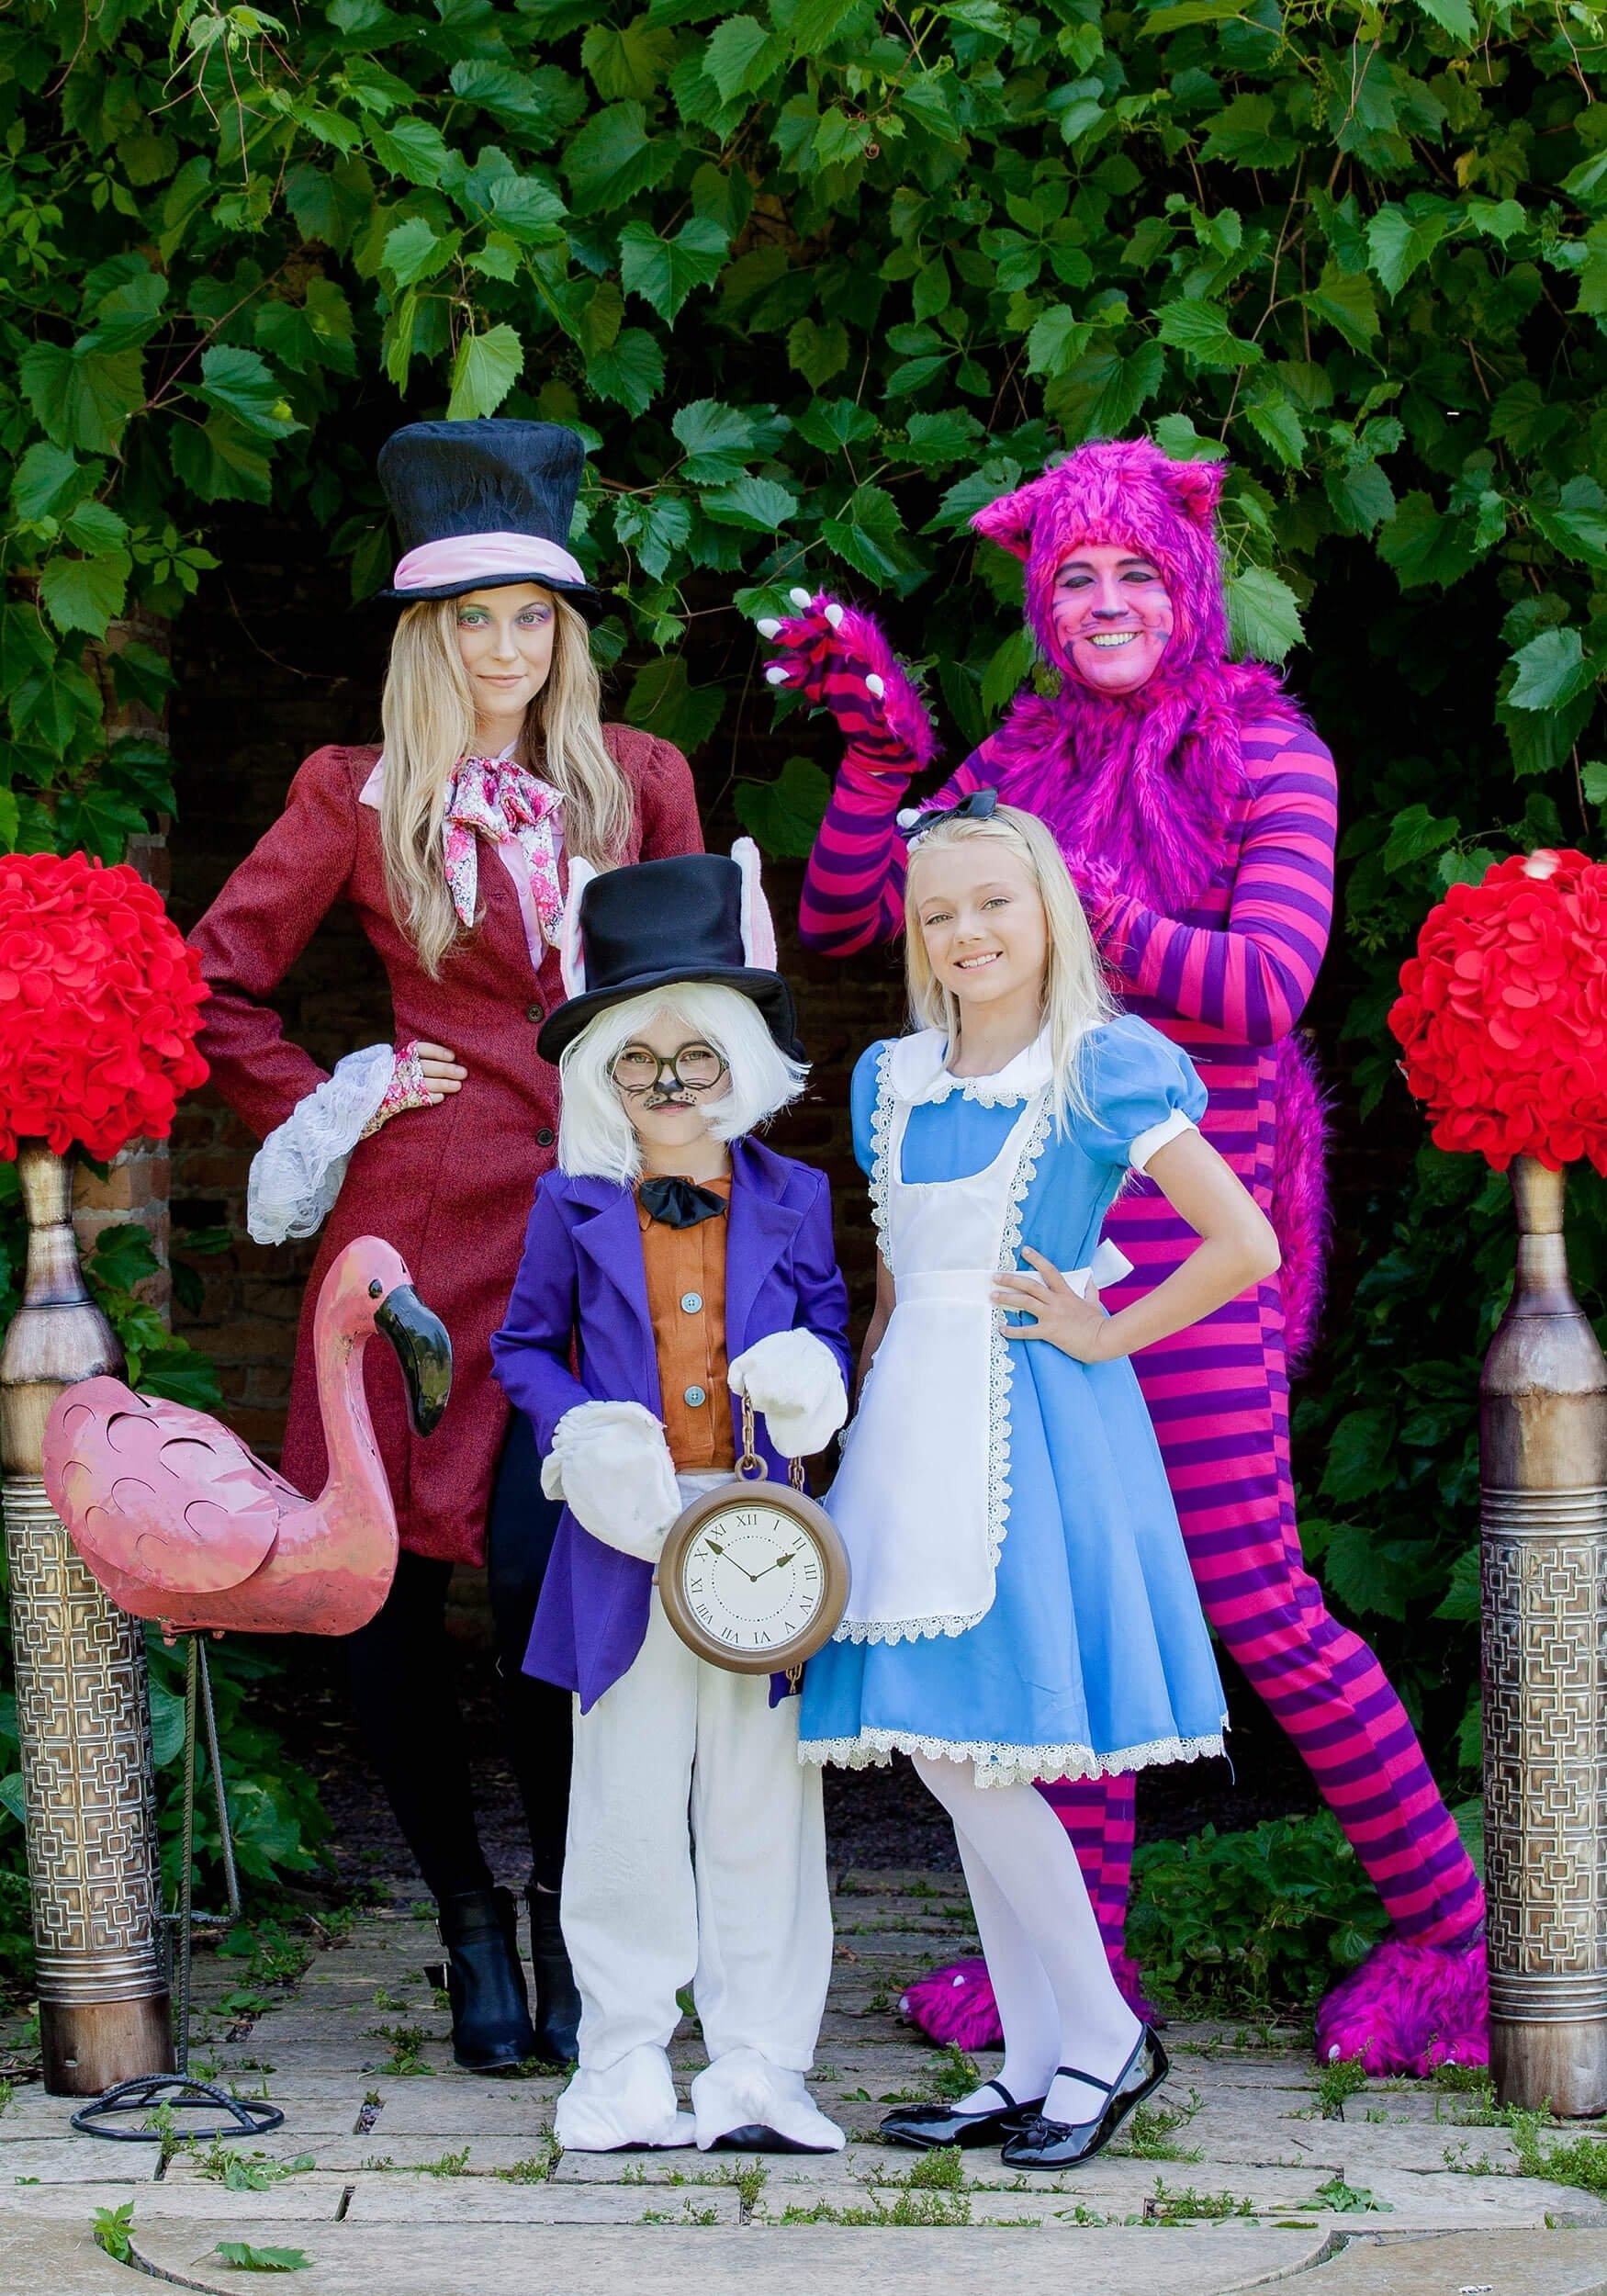 10 Gorgeous Alice And Wonderland Costume Ideas best family halloween costume ideas for 2016 halloween costumes blog 1 2020